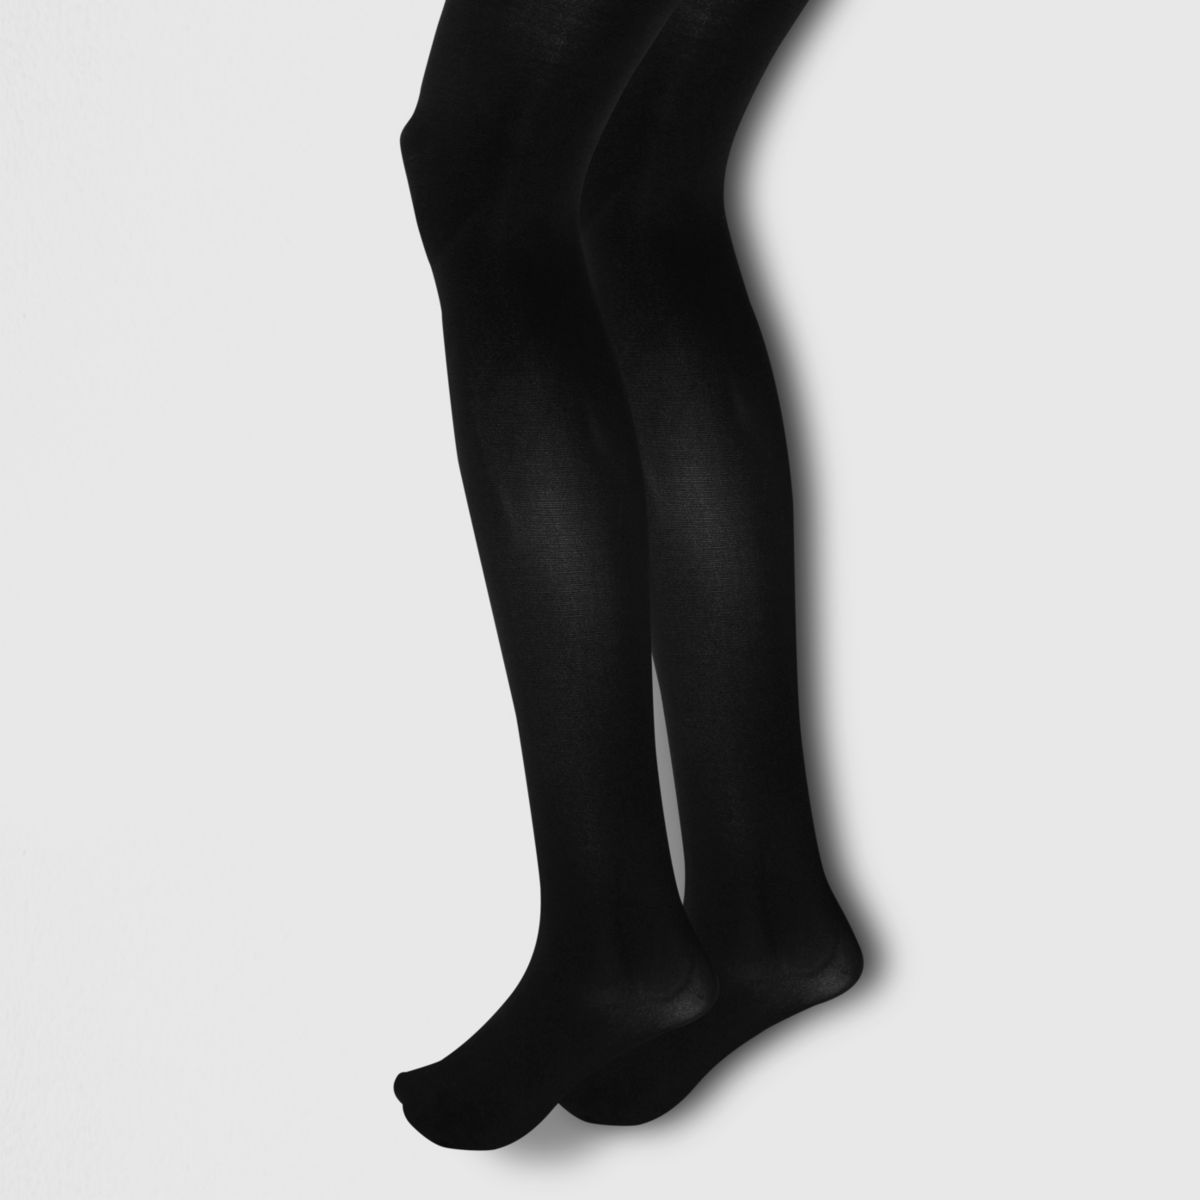 Schwarze, blickdichte Strumpfhosen, Multipack